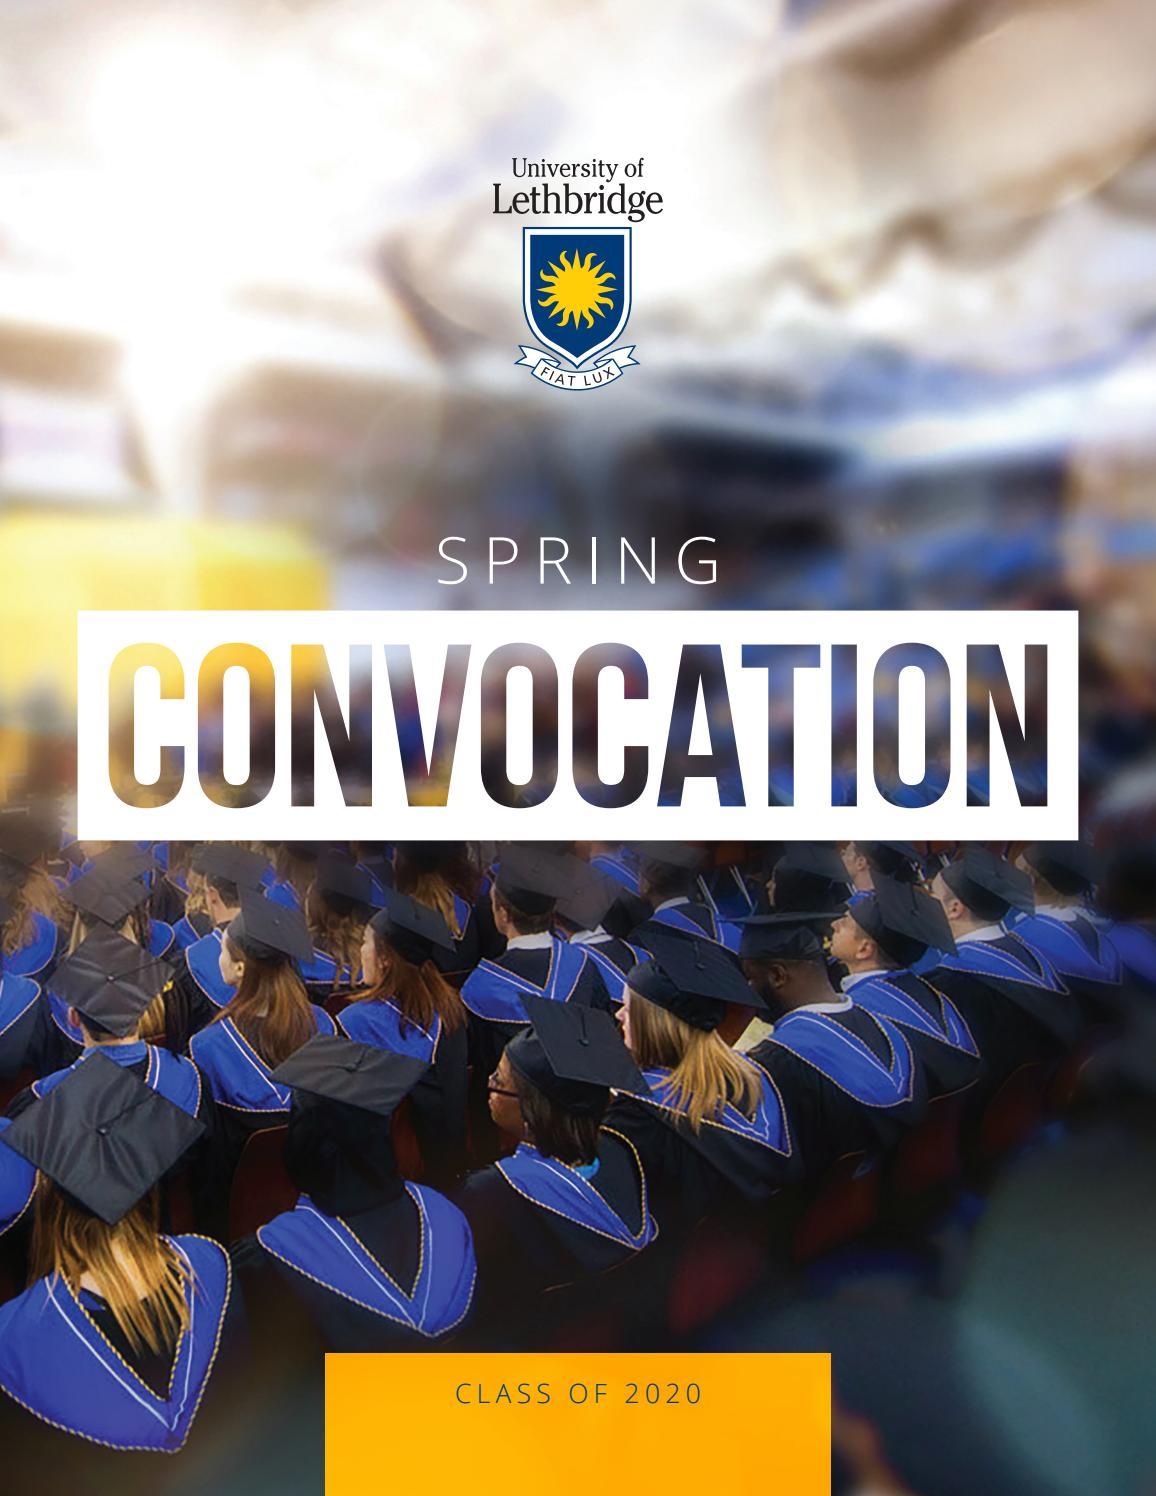 Ulethbridge Spring 2020 Convocation Program By University Of Lethbridge Issuu